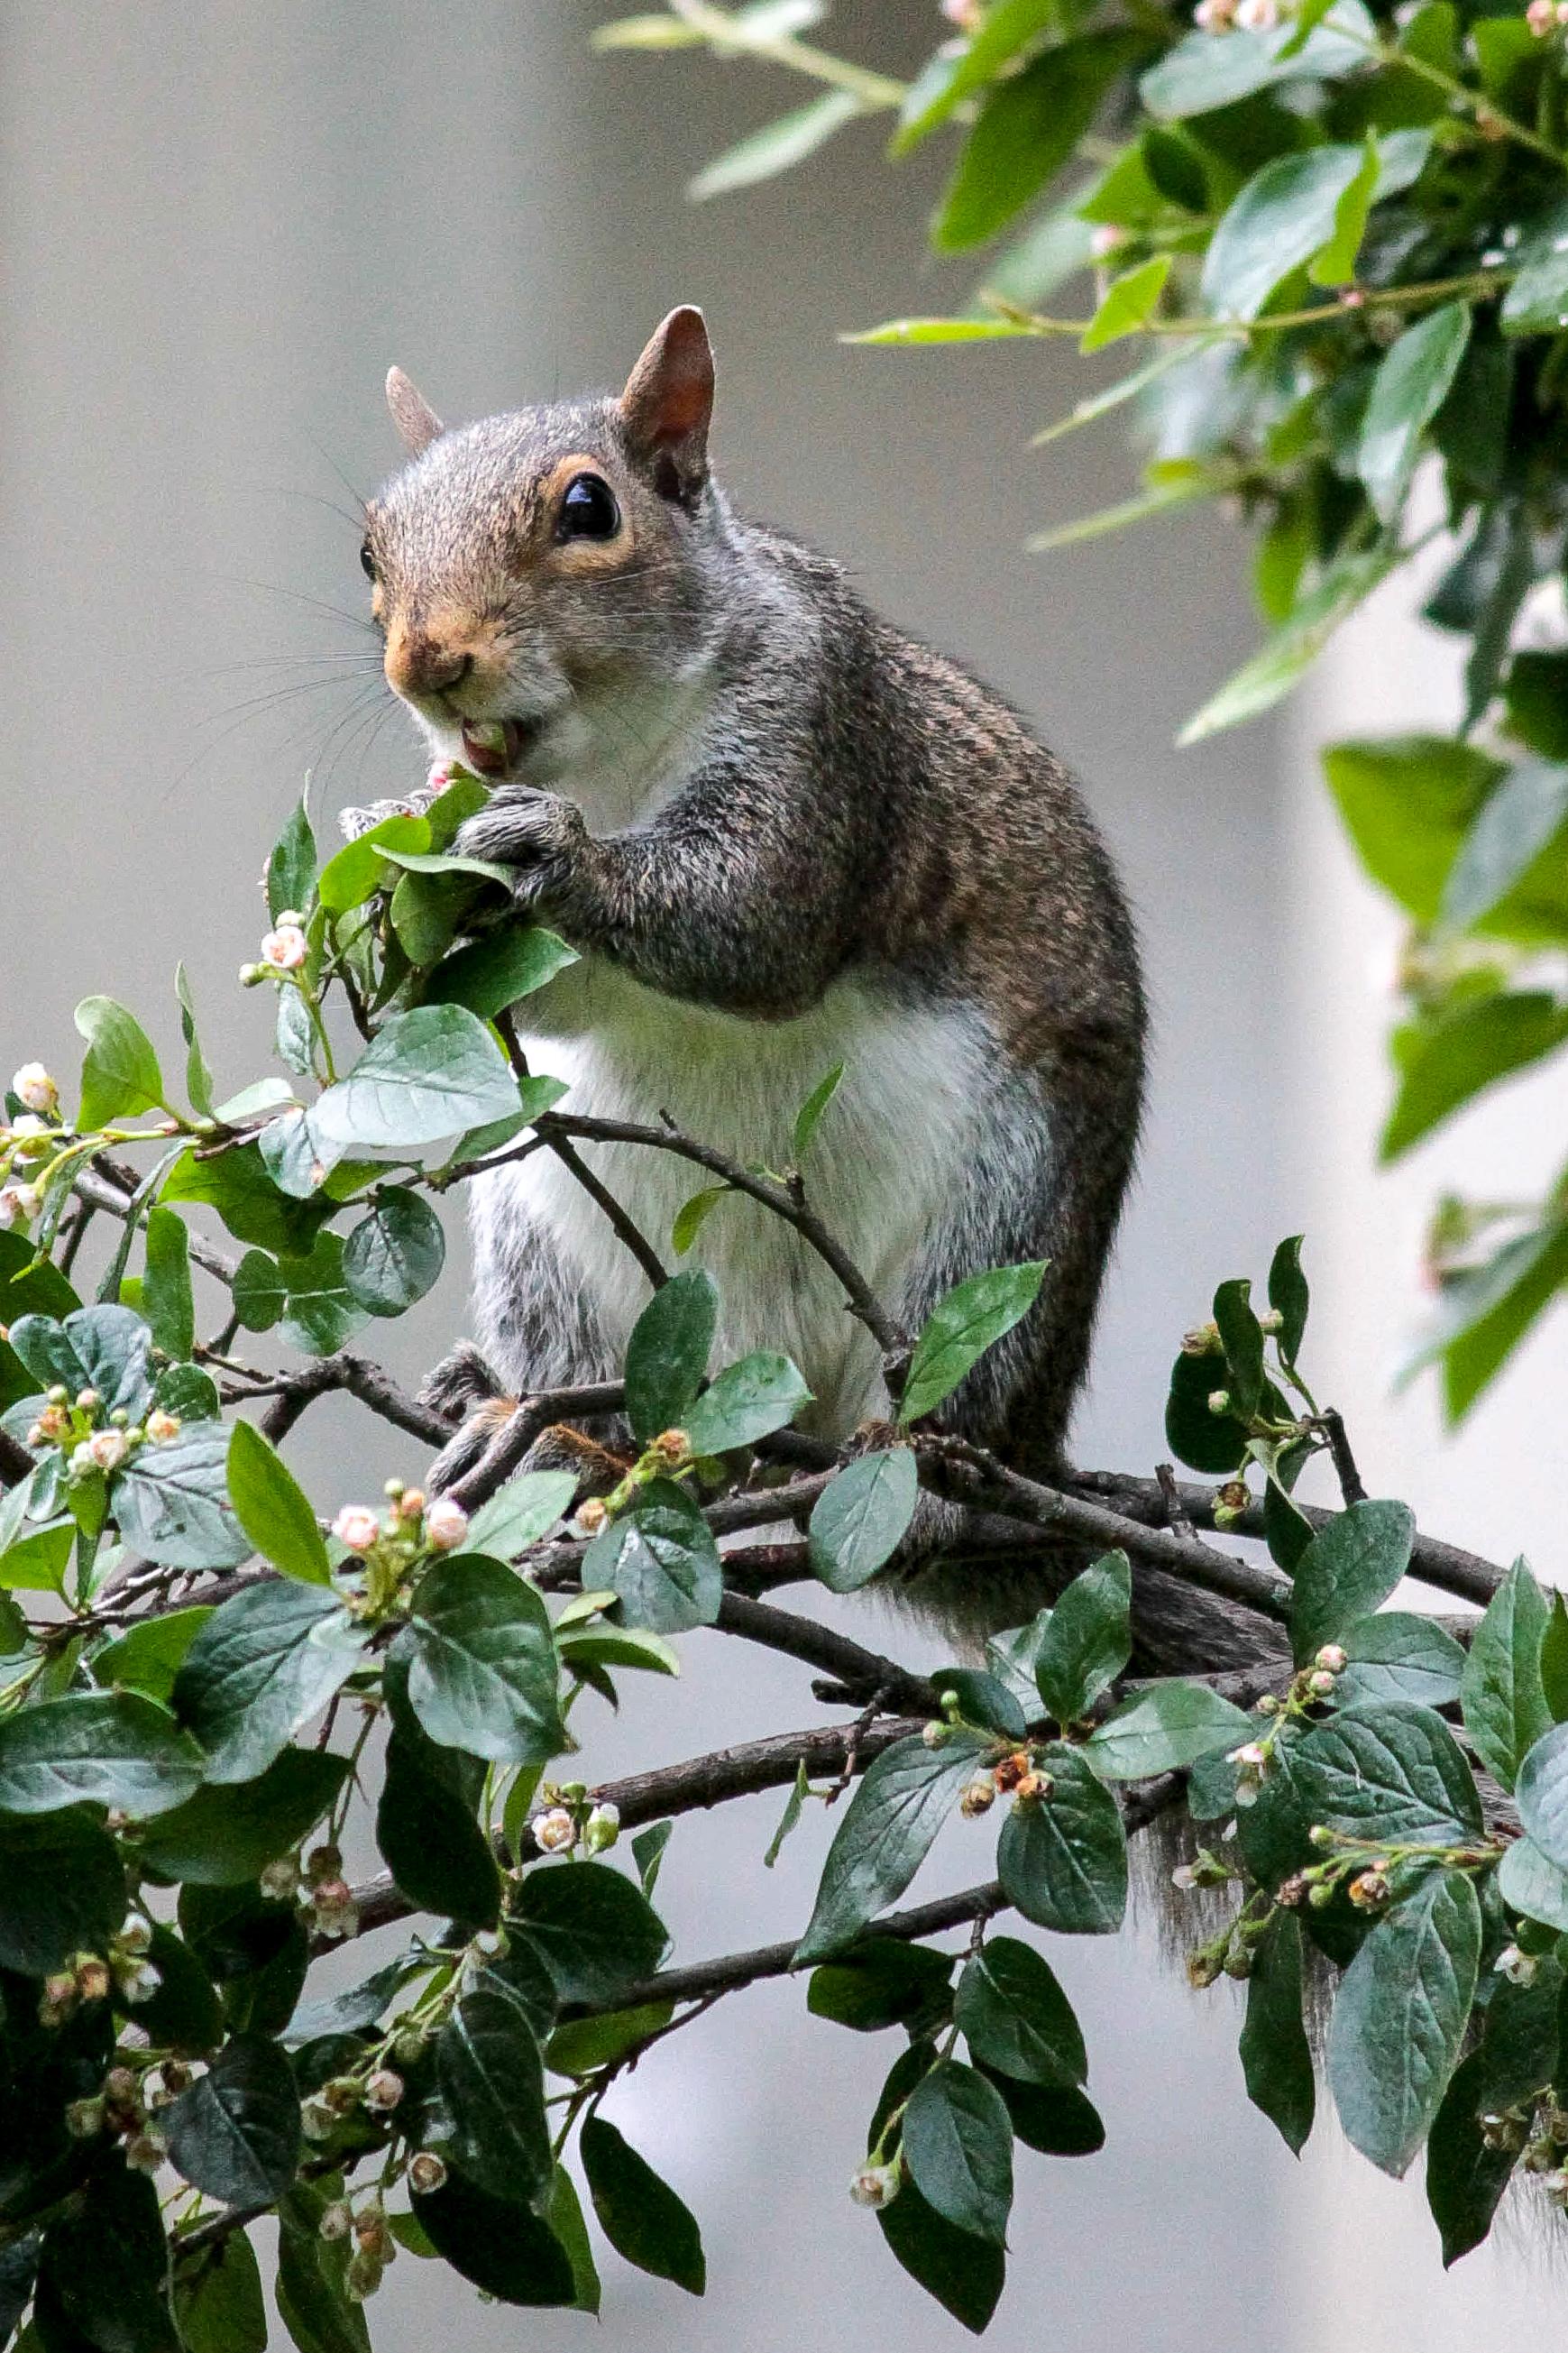 A squirrel eats berries in Milwaukee, Wisconsin.